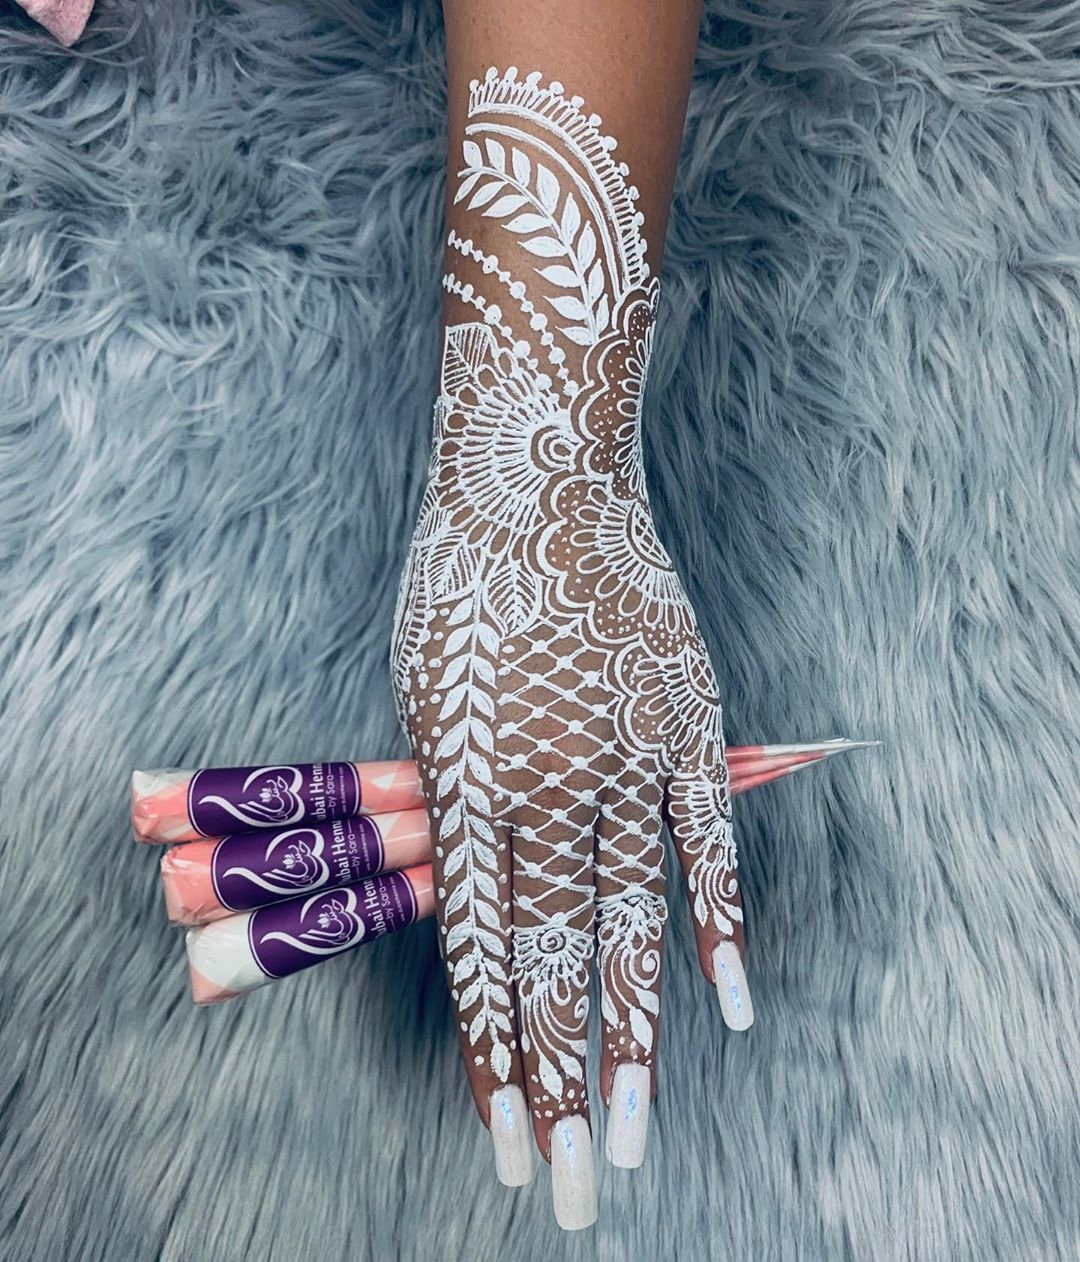 Introducing Dubai Henna: The UAE's First Online Organic Henna Shop